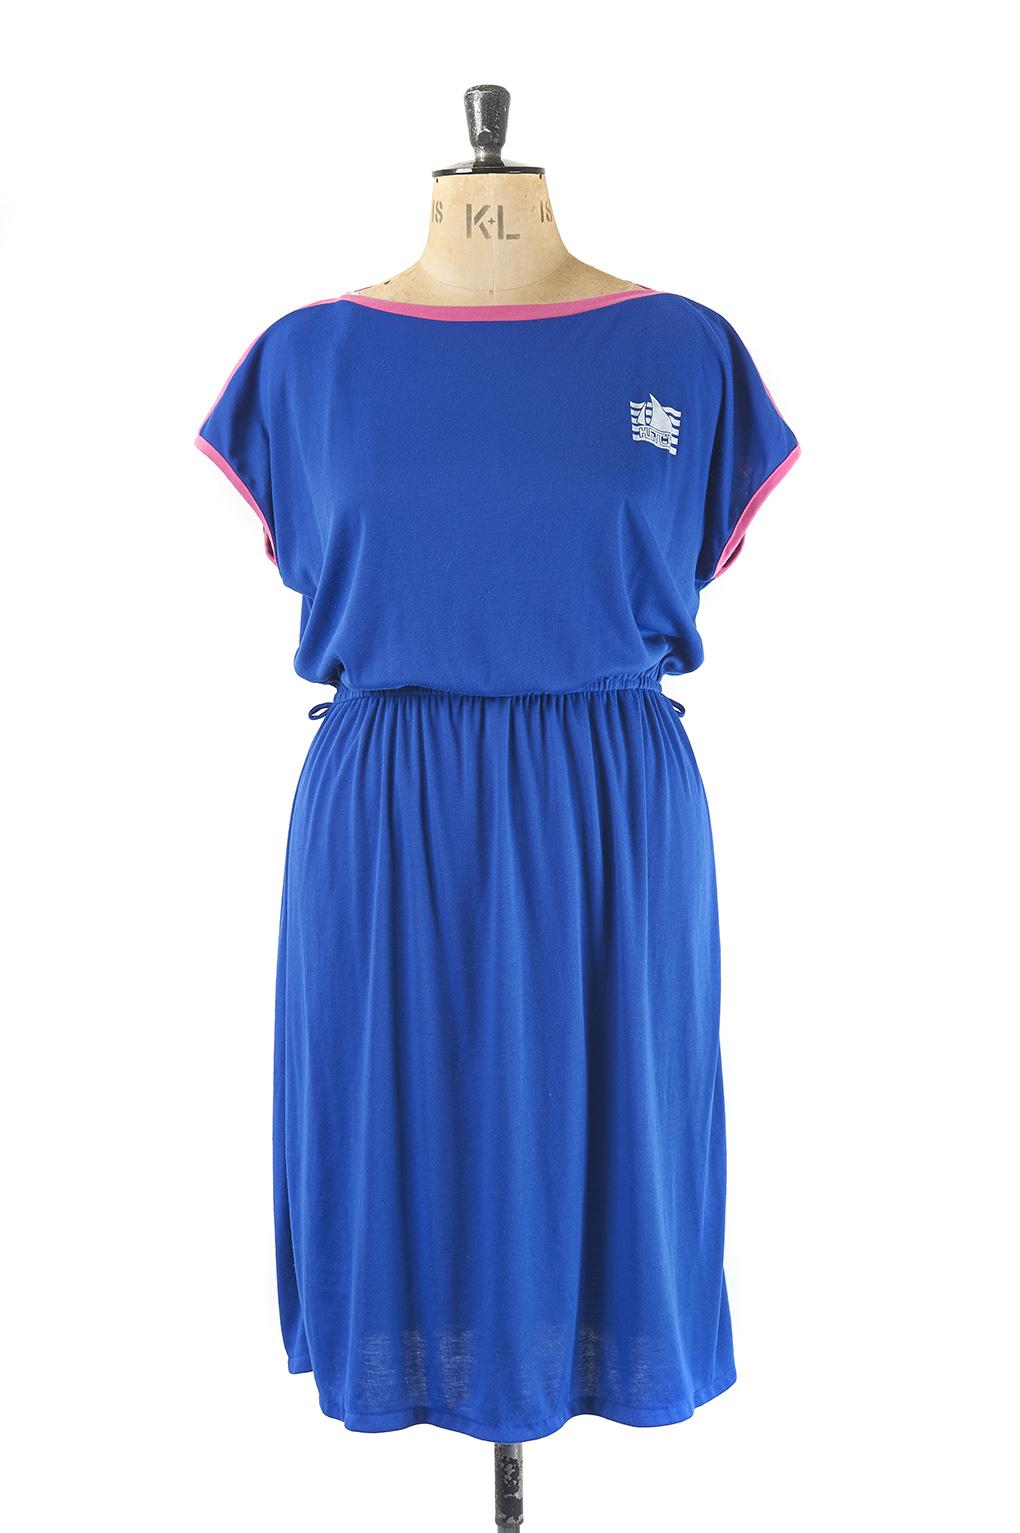 Plus size vintage fashion Sumer Jersey Dress - Size 18